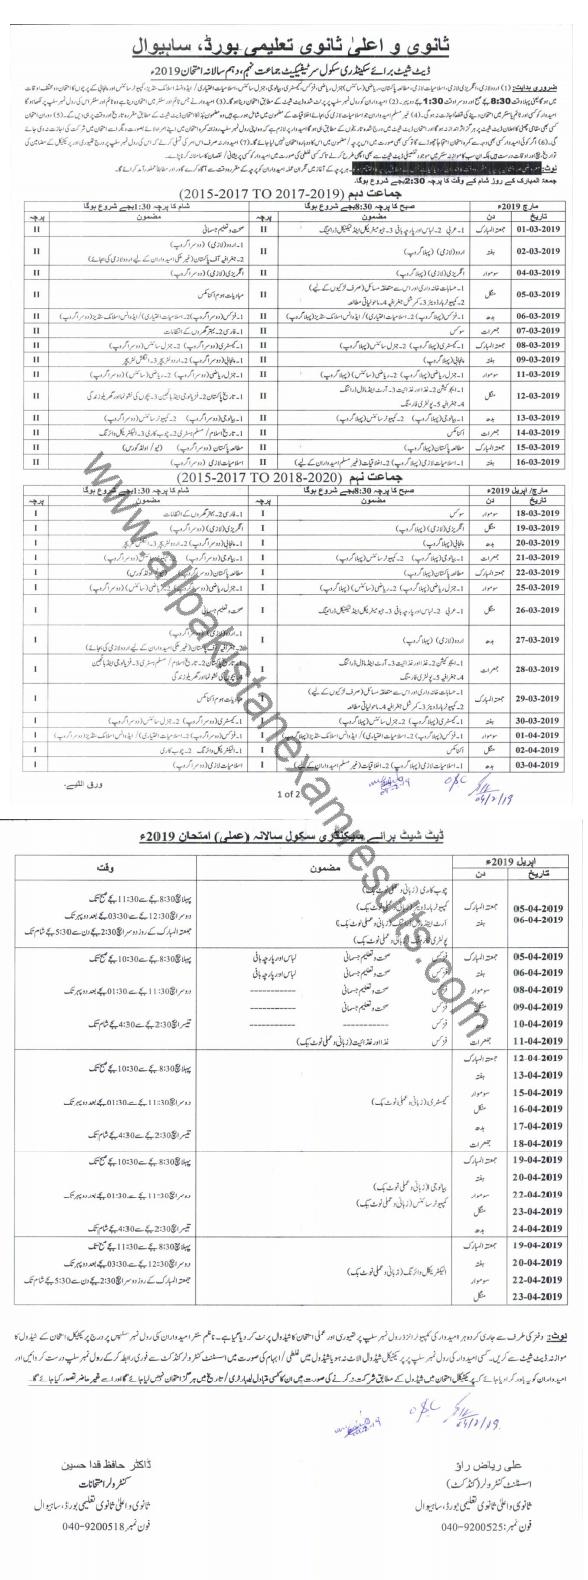 BISE Sahiwal 10th Class Date Sheet 2019